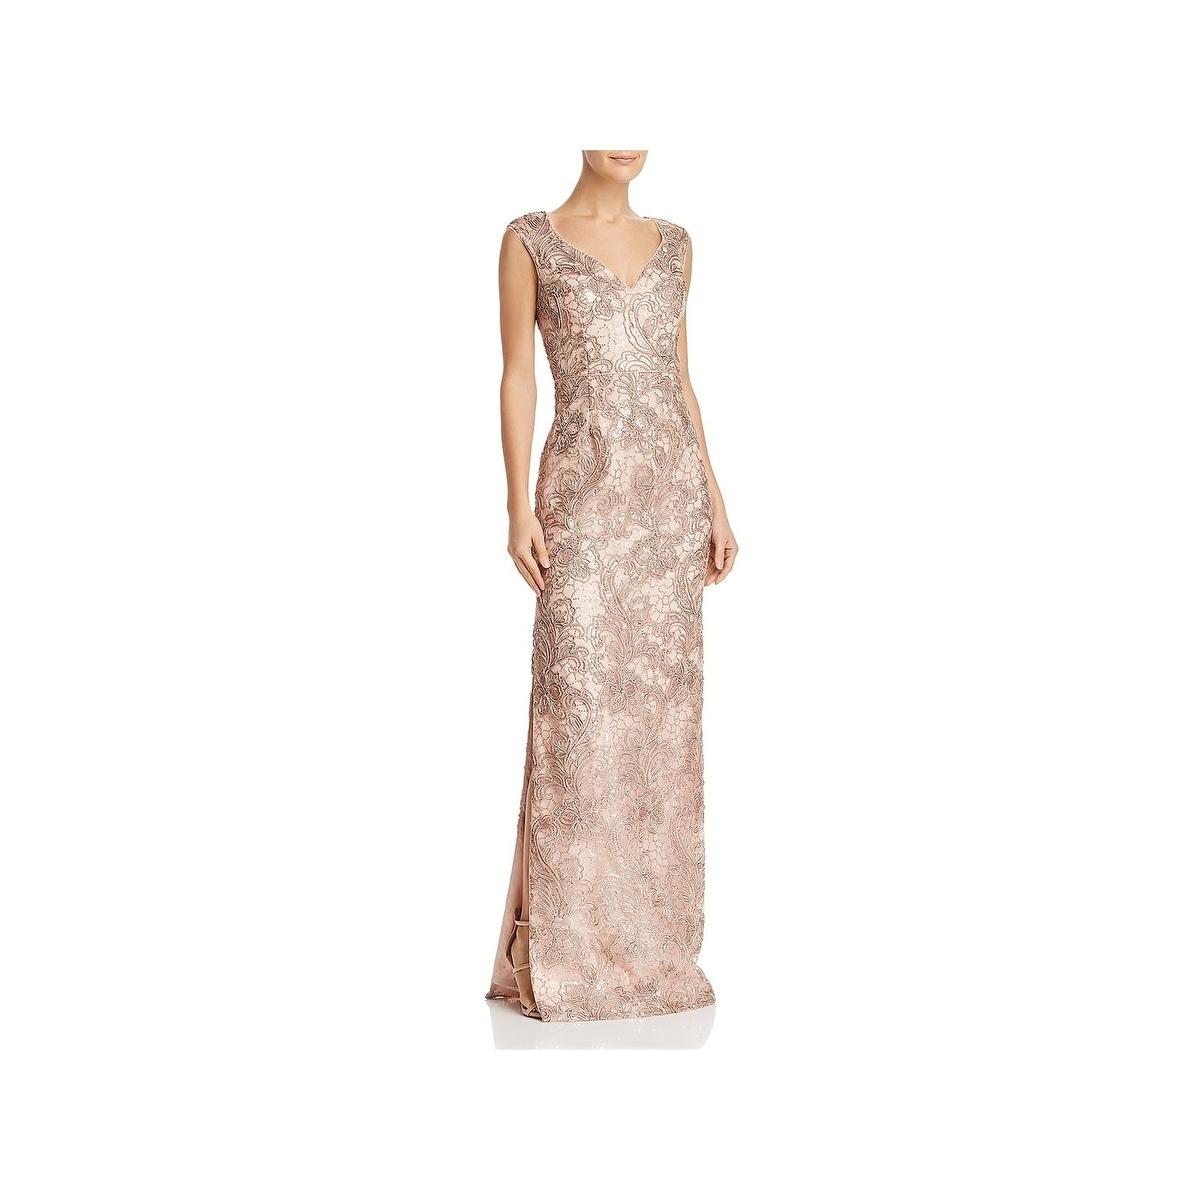 97fba123056e Buy Beige Evening & Formal Dresses Online at Overstock | Our Best Dresses  Deals